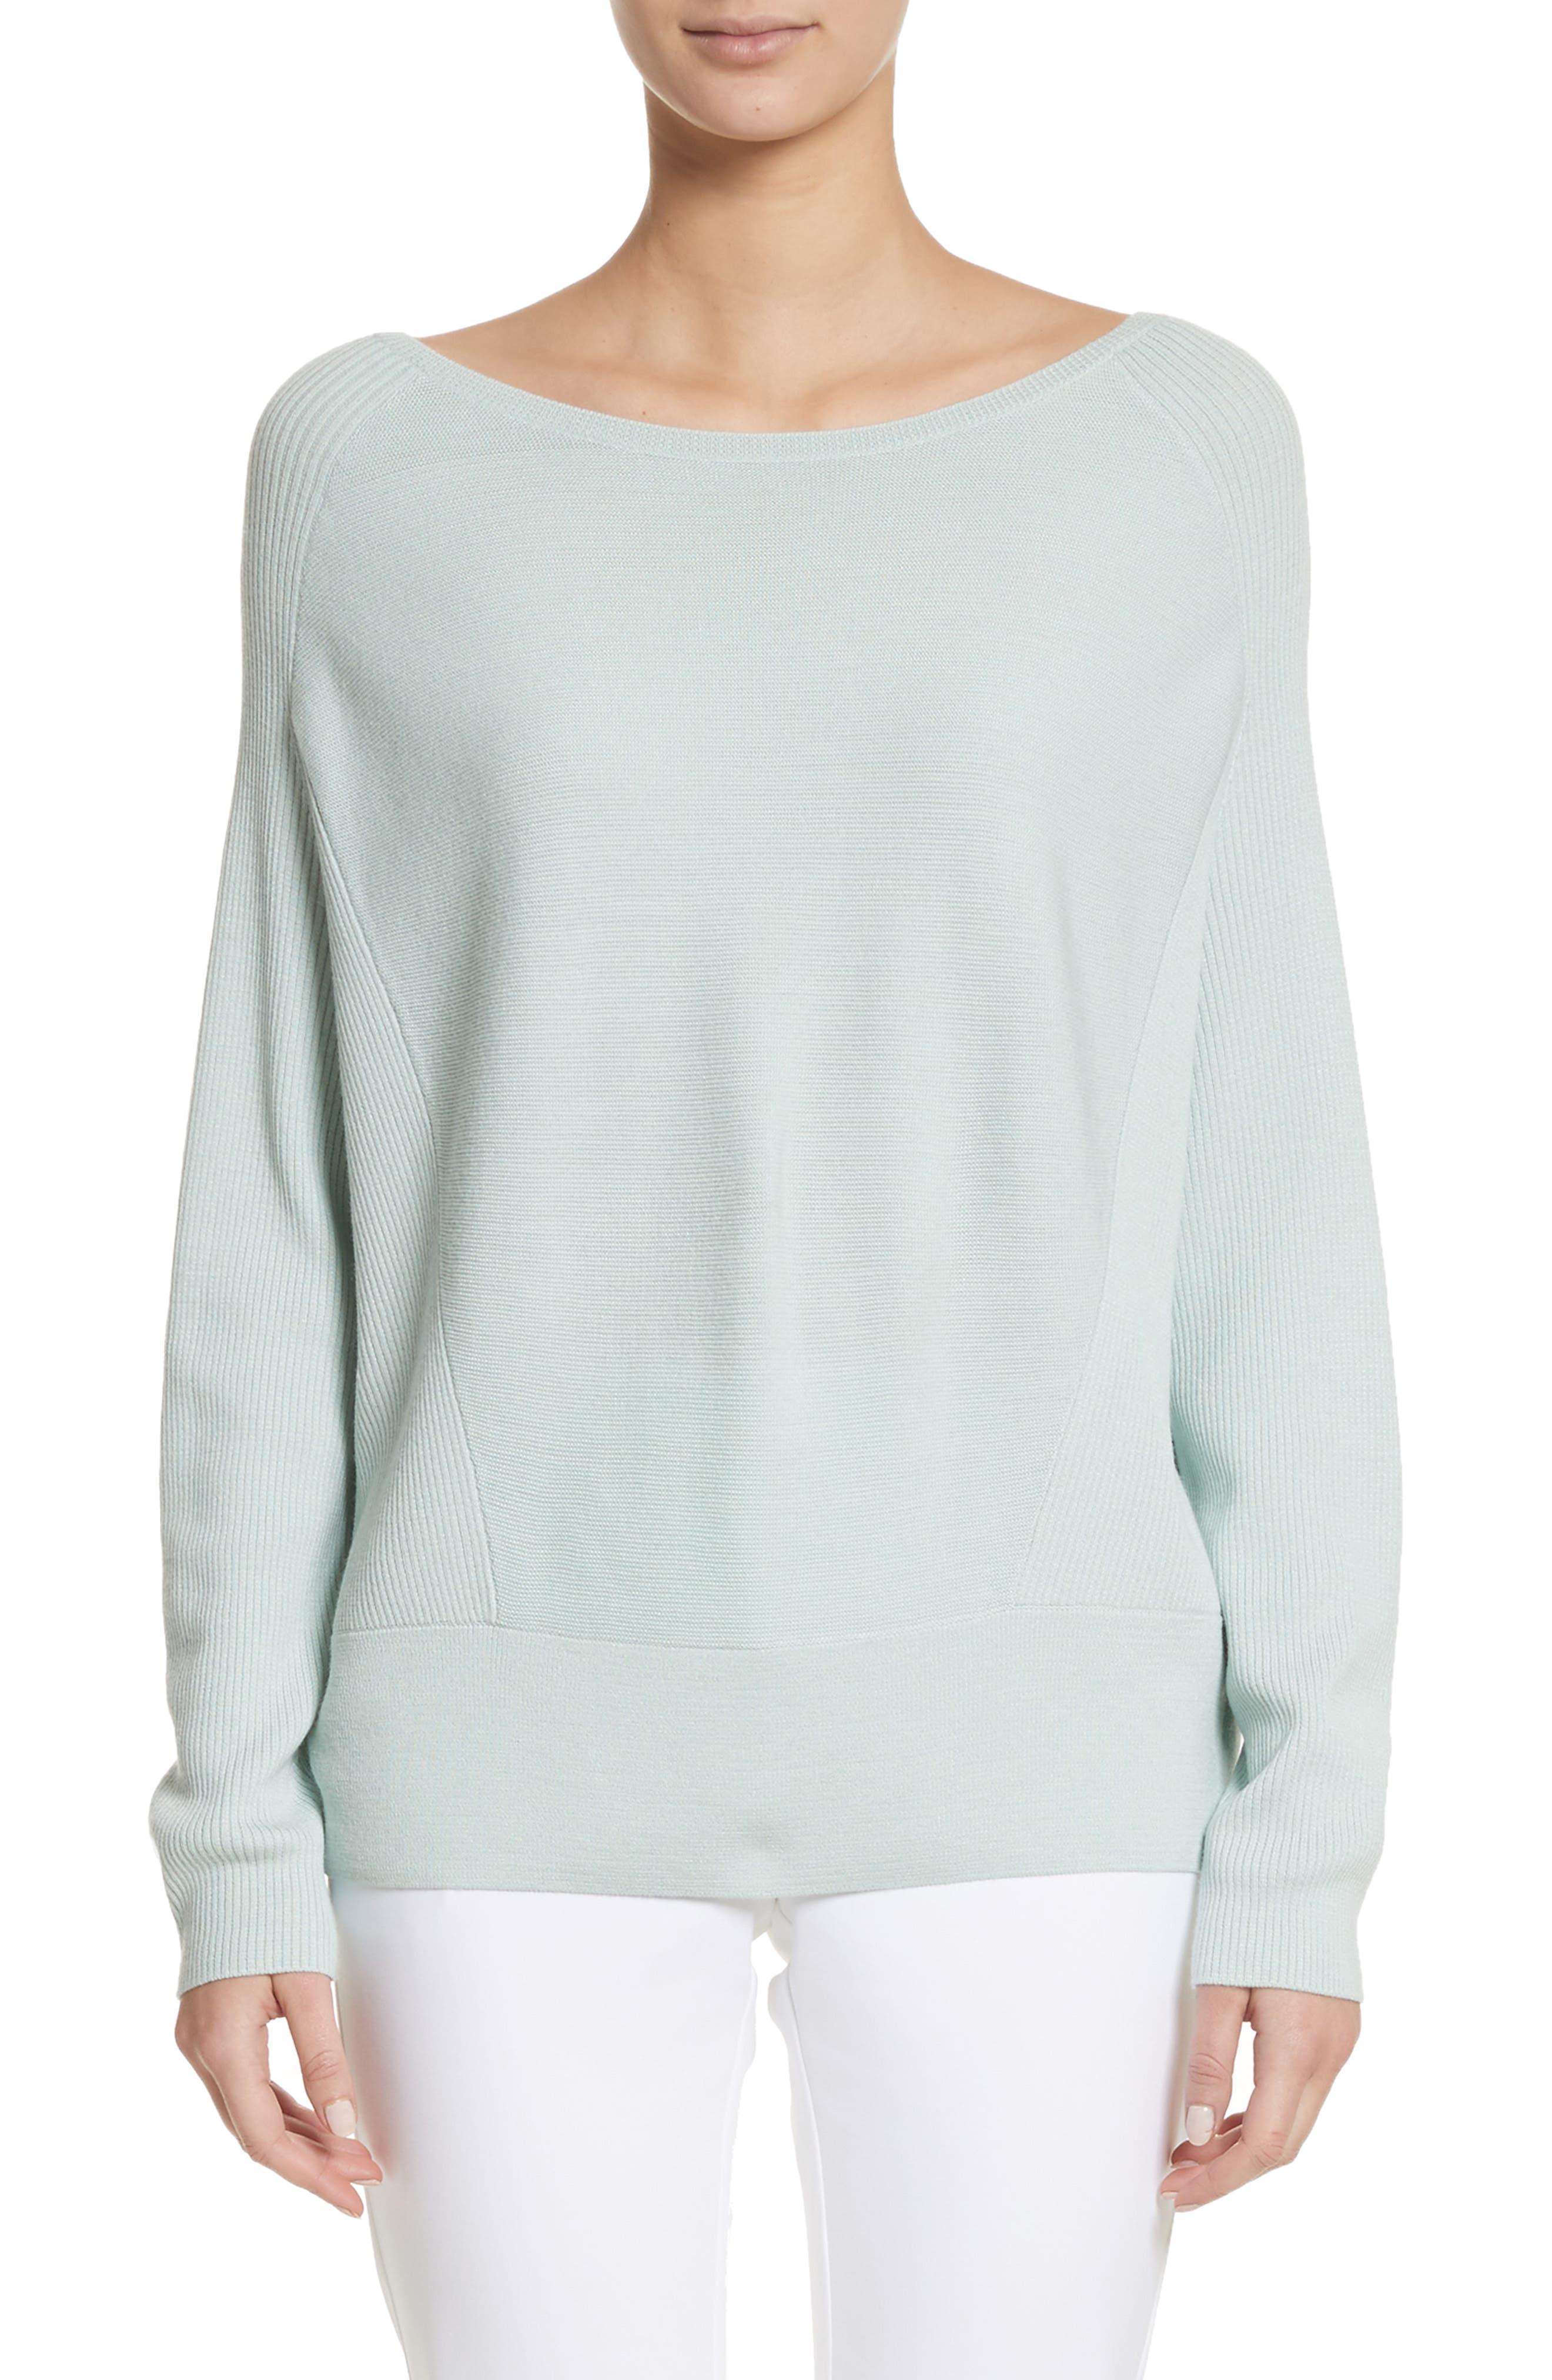 Links Rib Knit Sweater,                         Main,                         color,